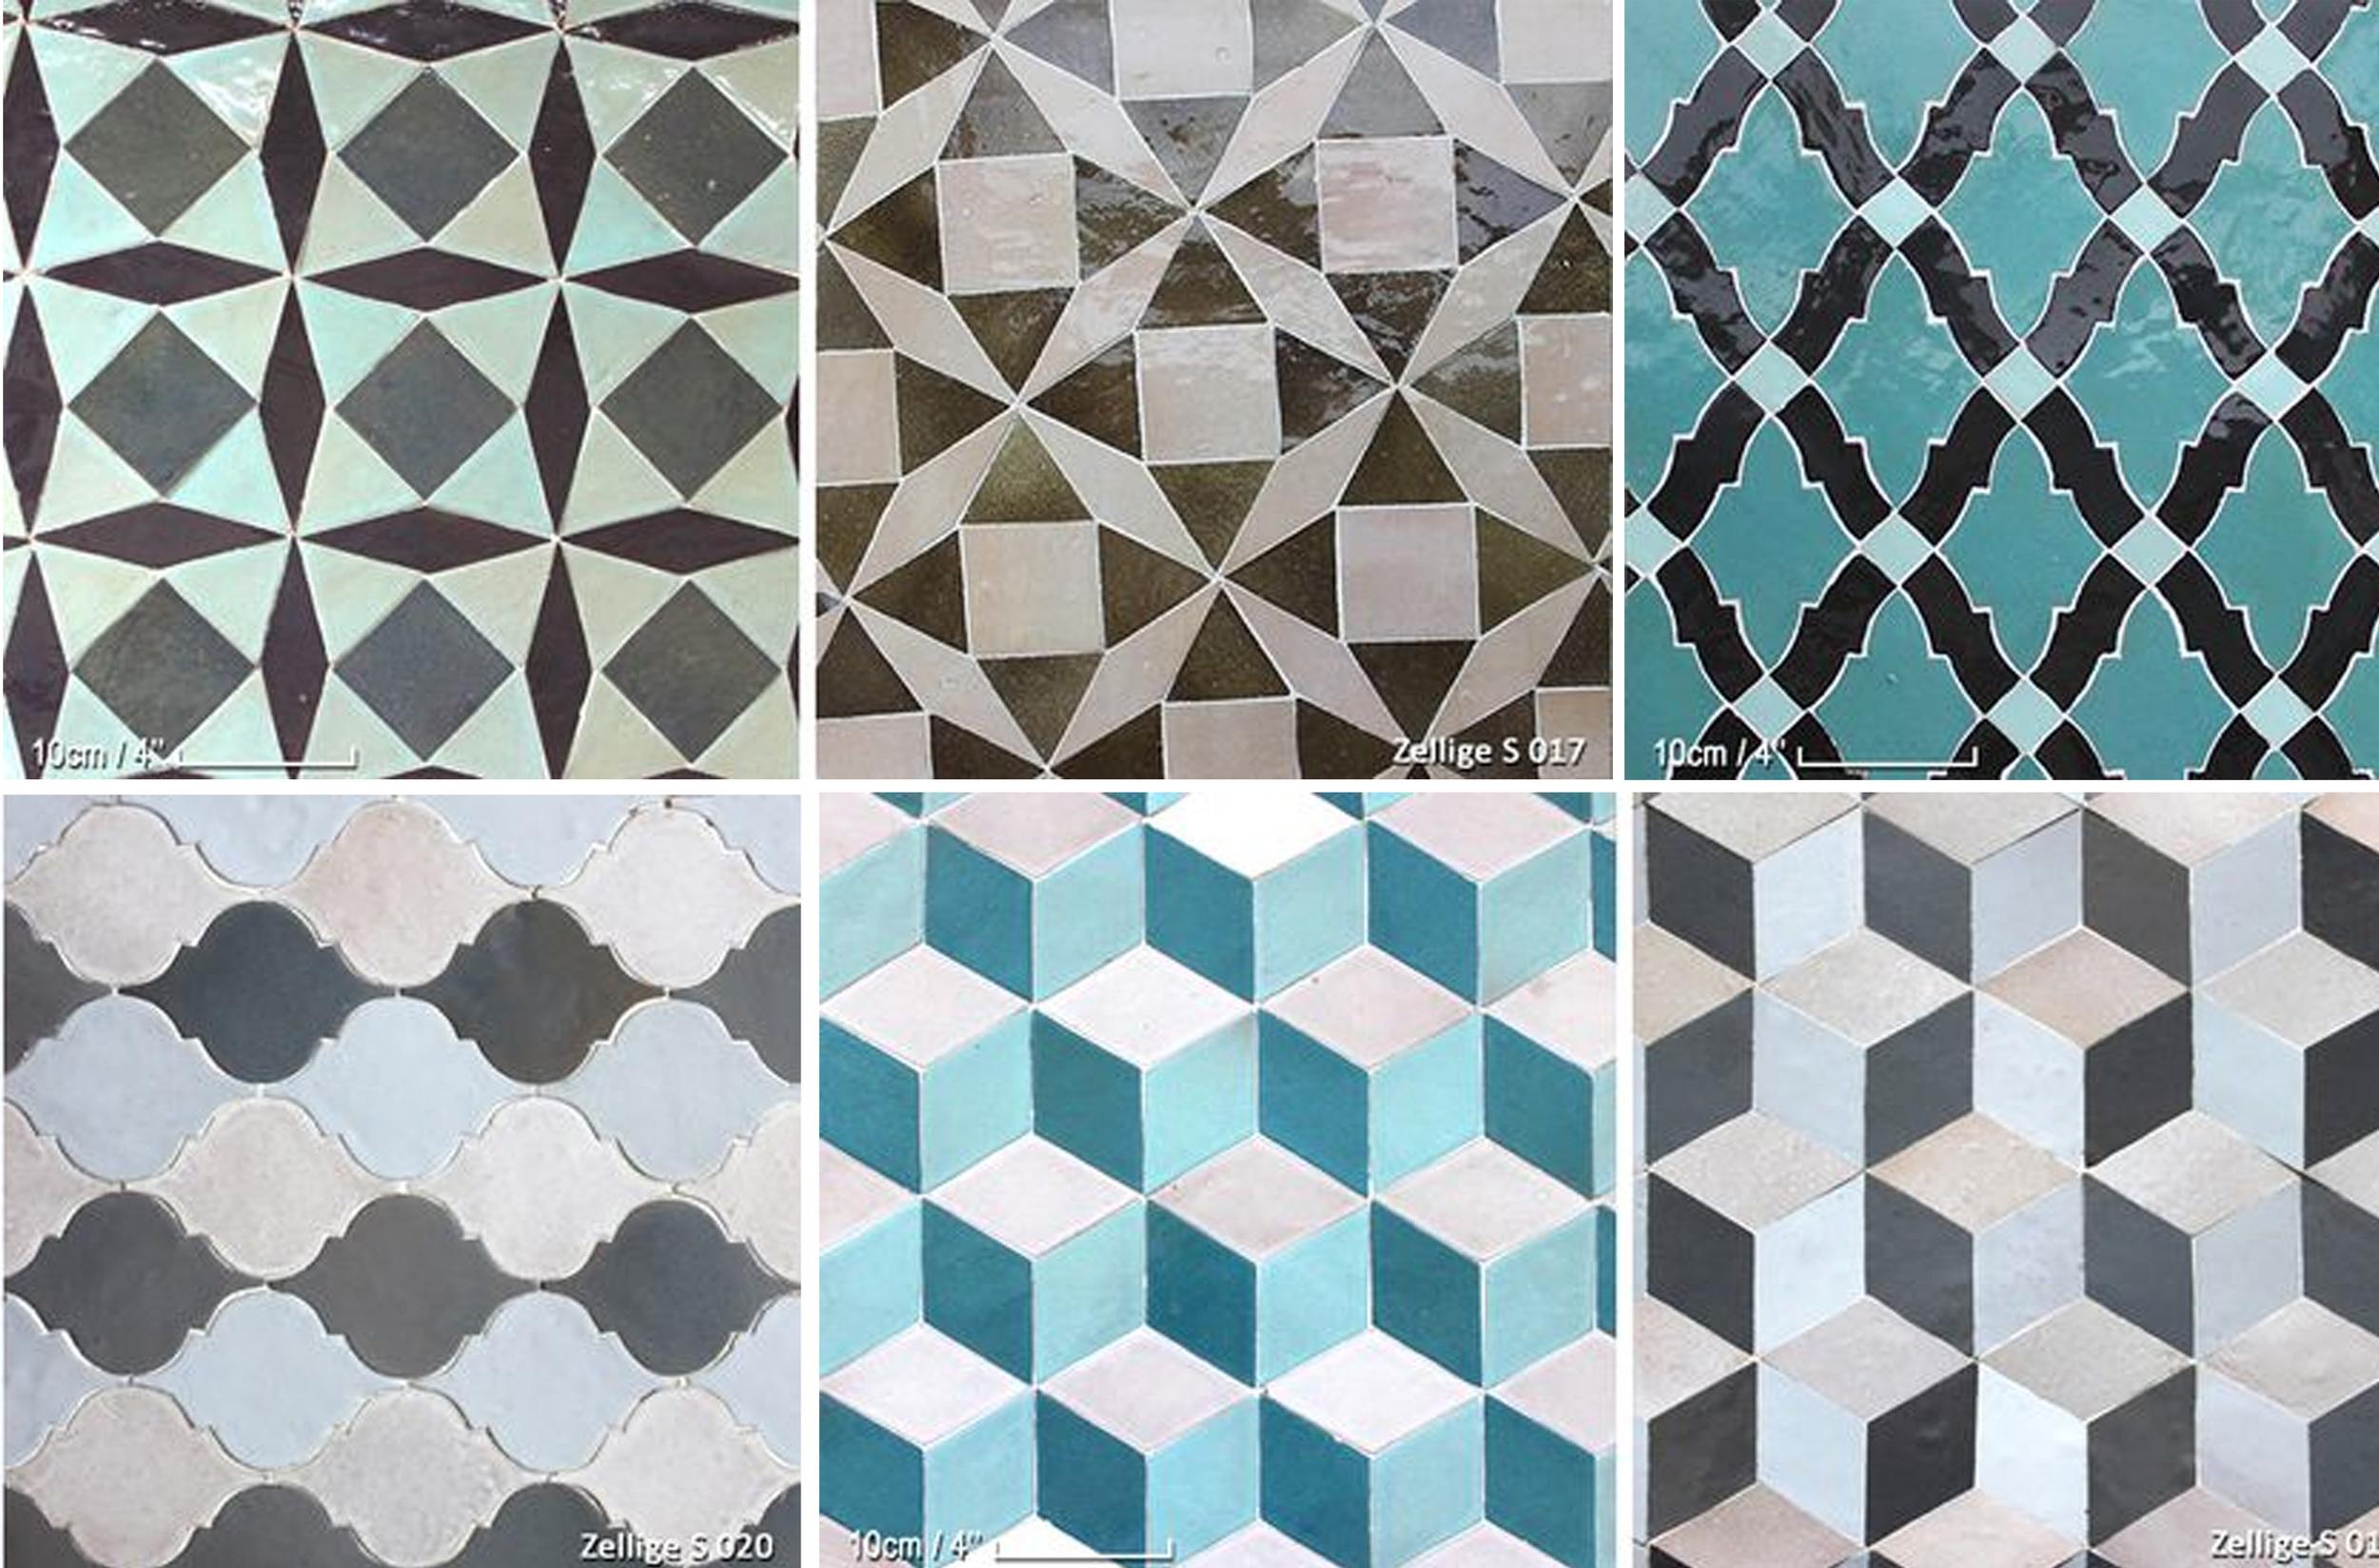 zellige shapes and designs